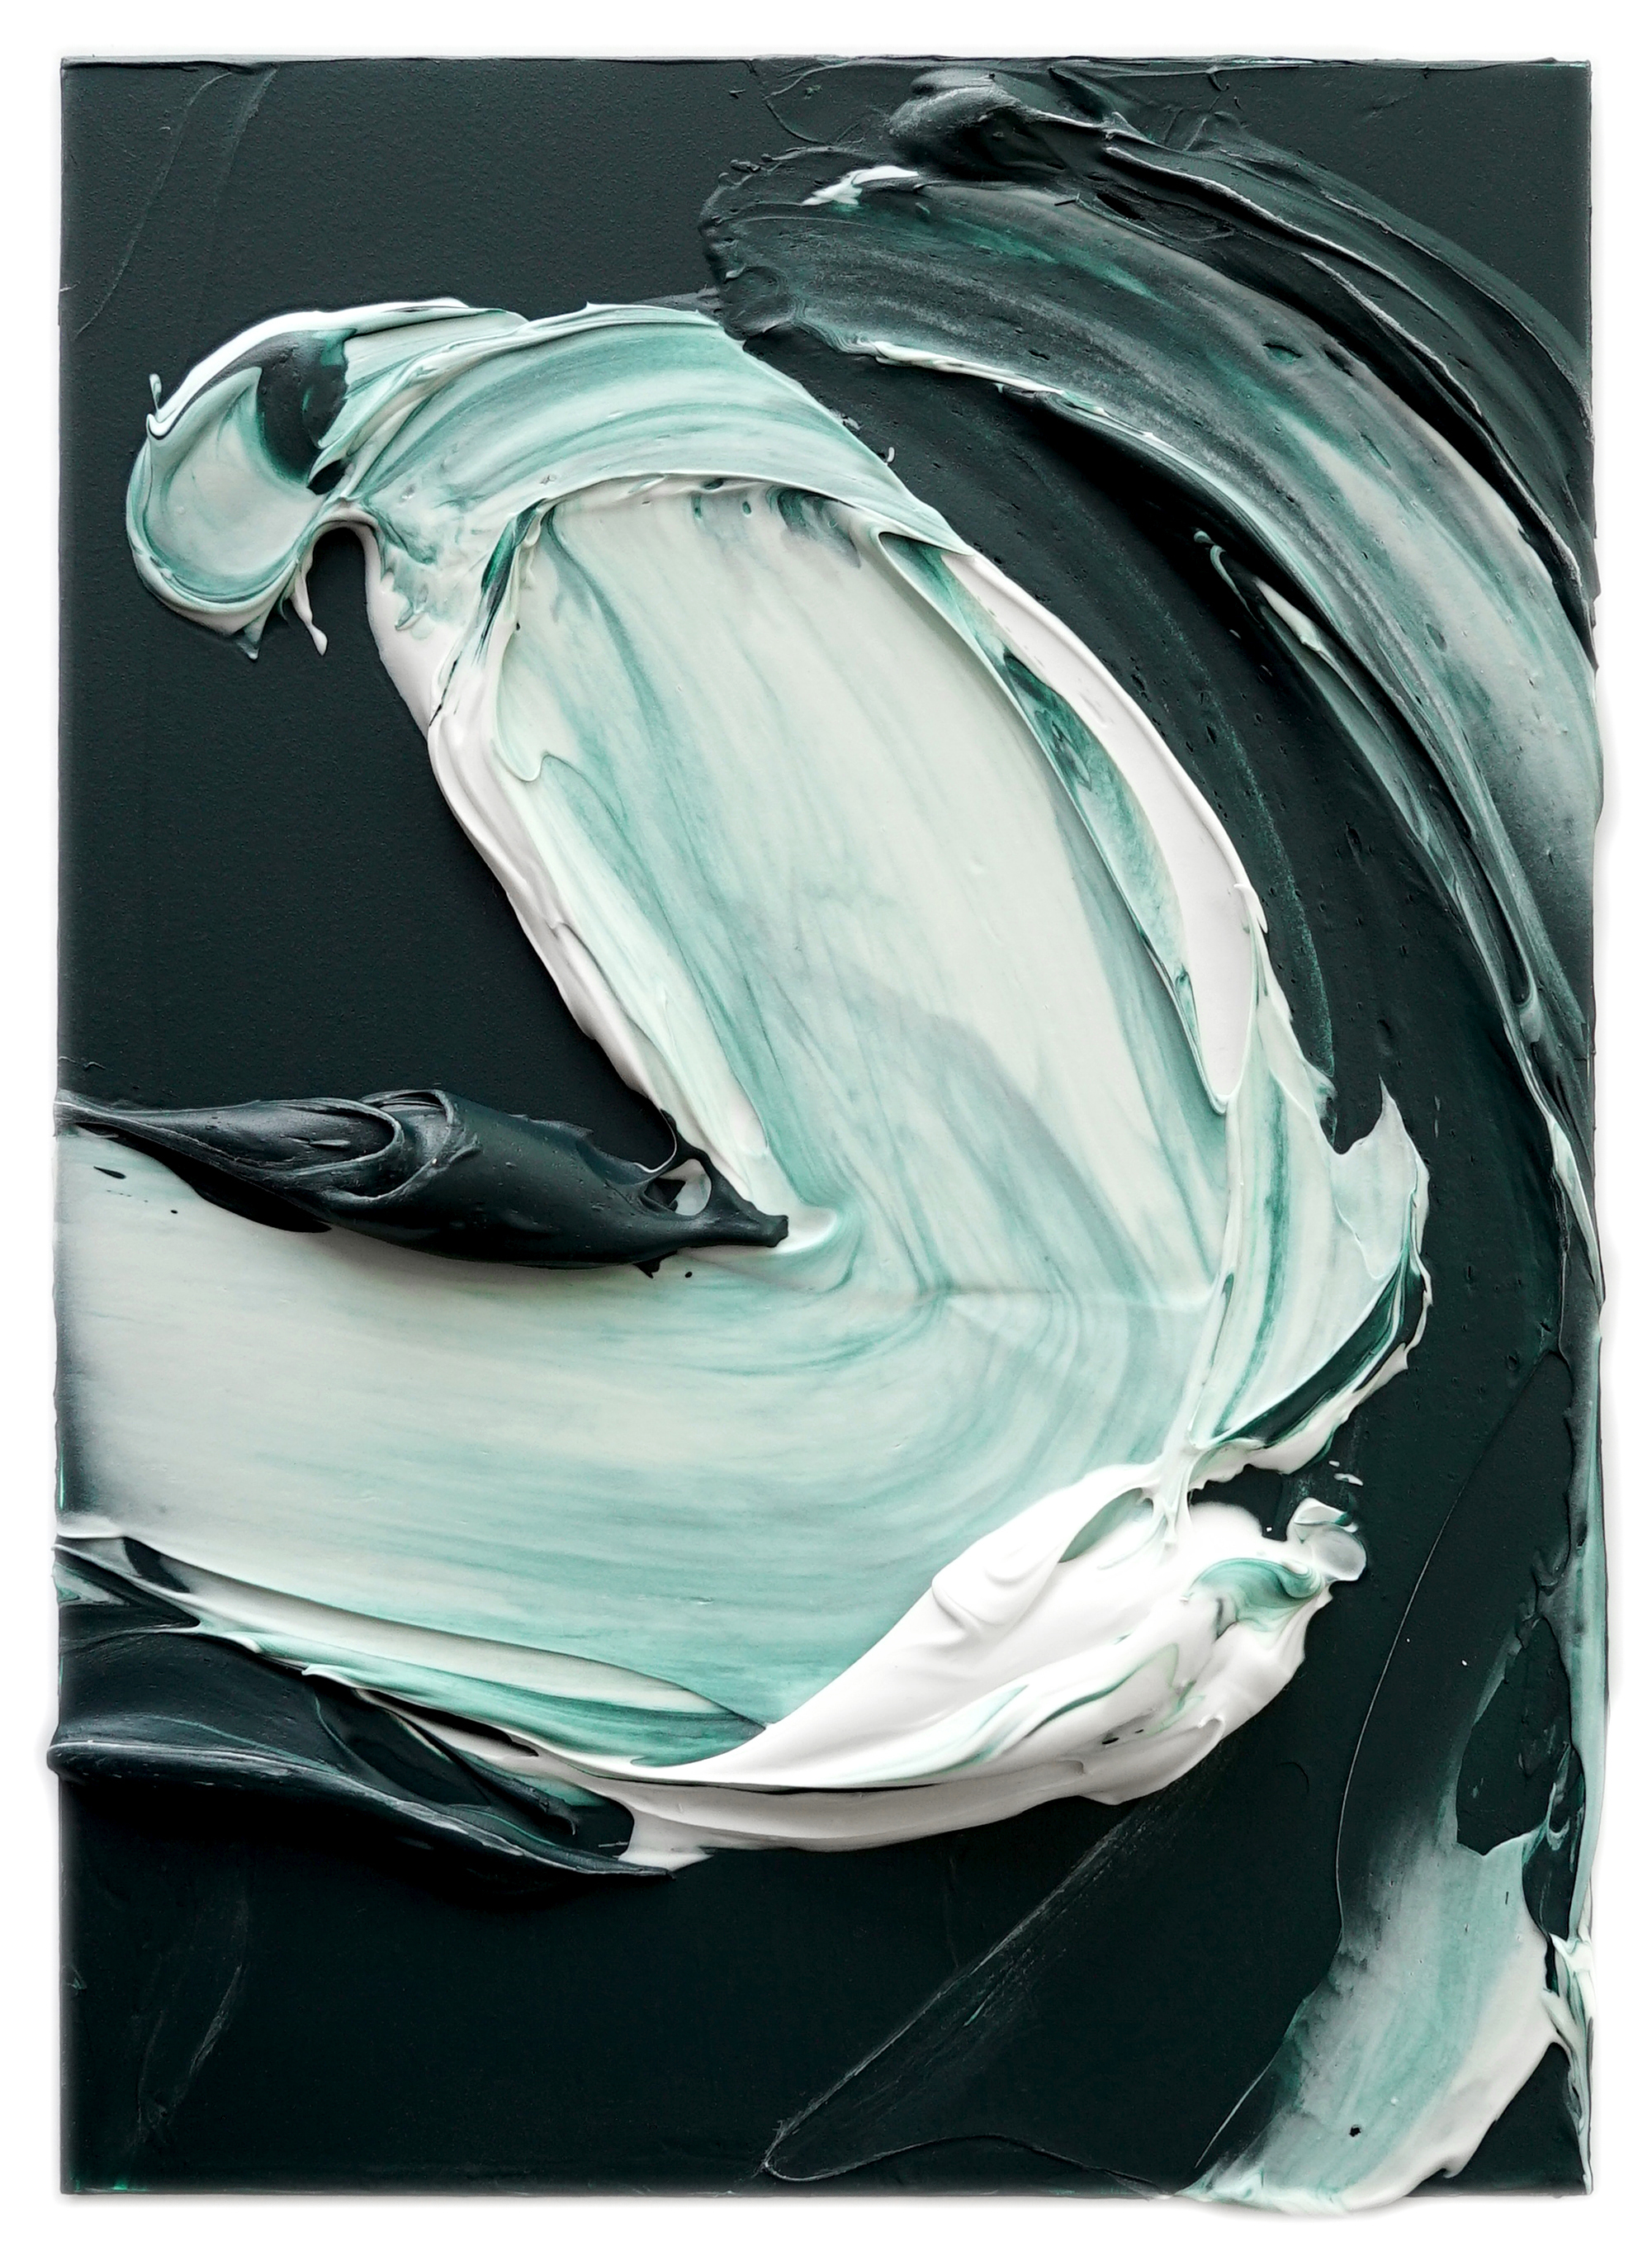 Sarah-Lund-Art-Fireclay.jpg